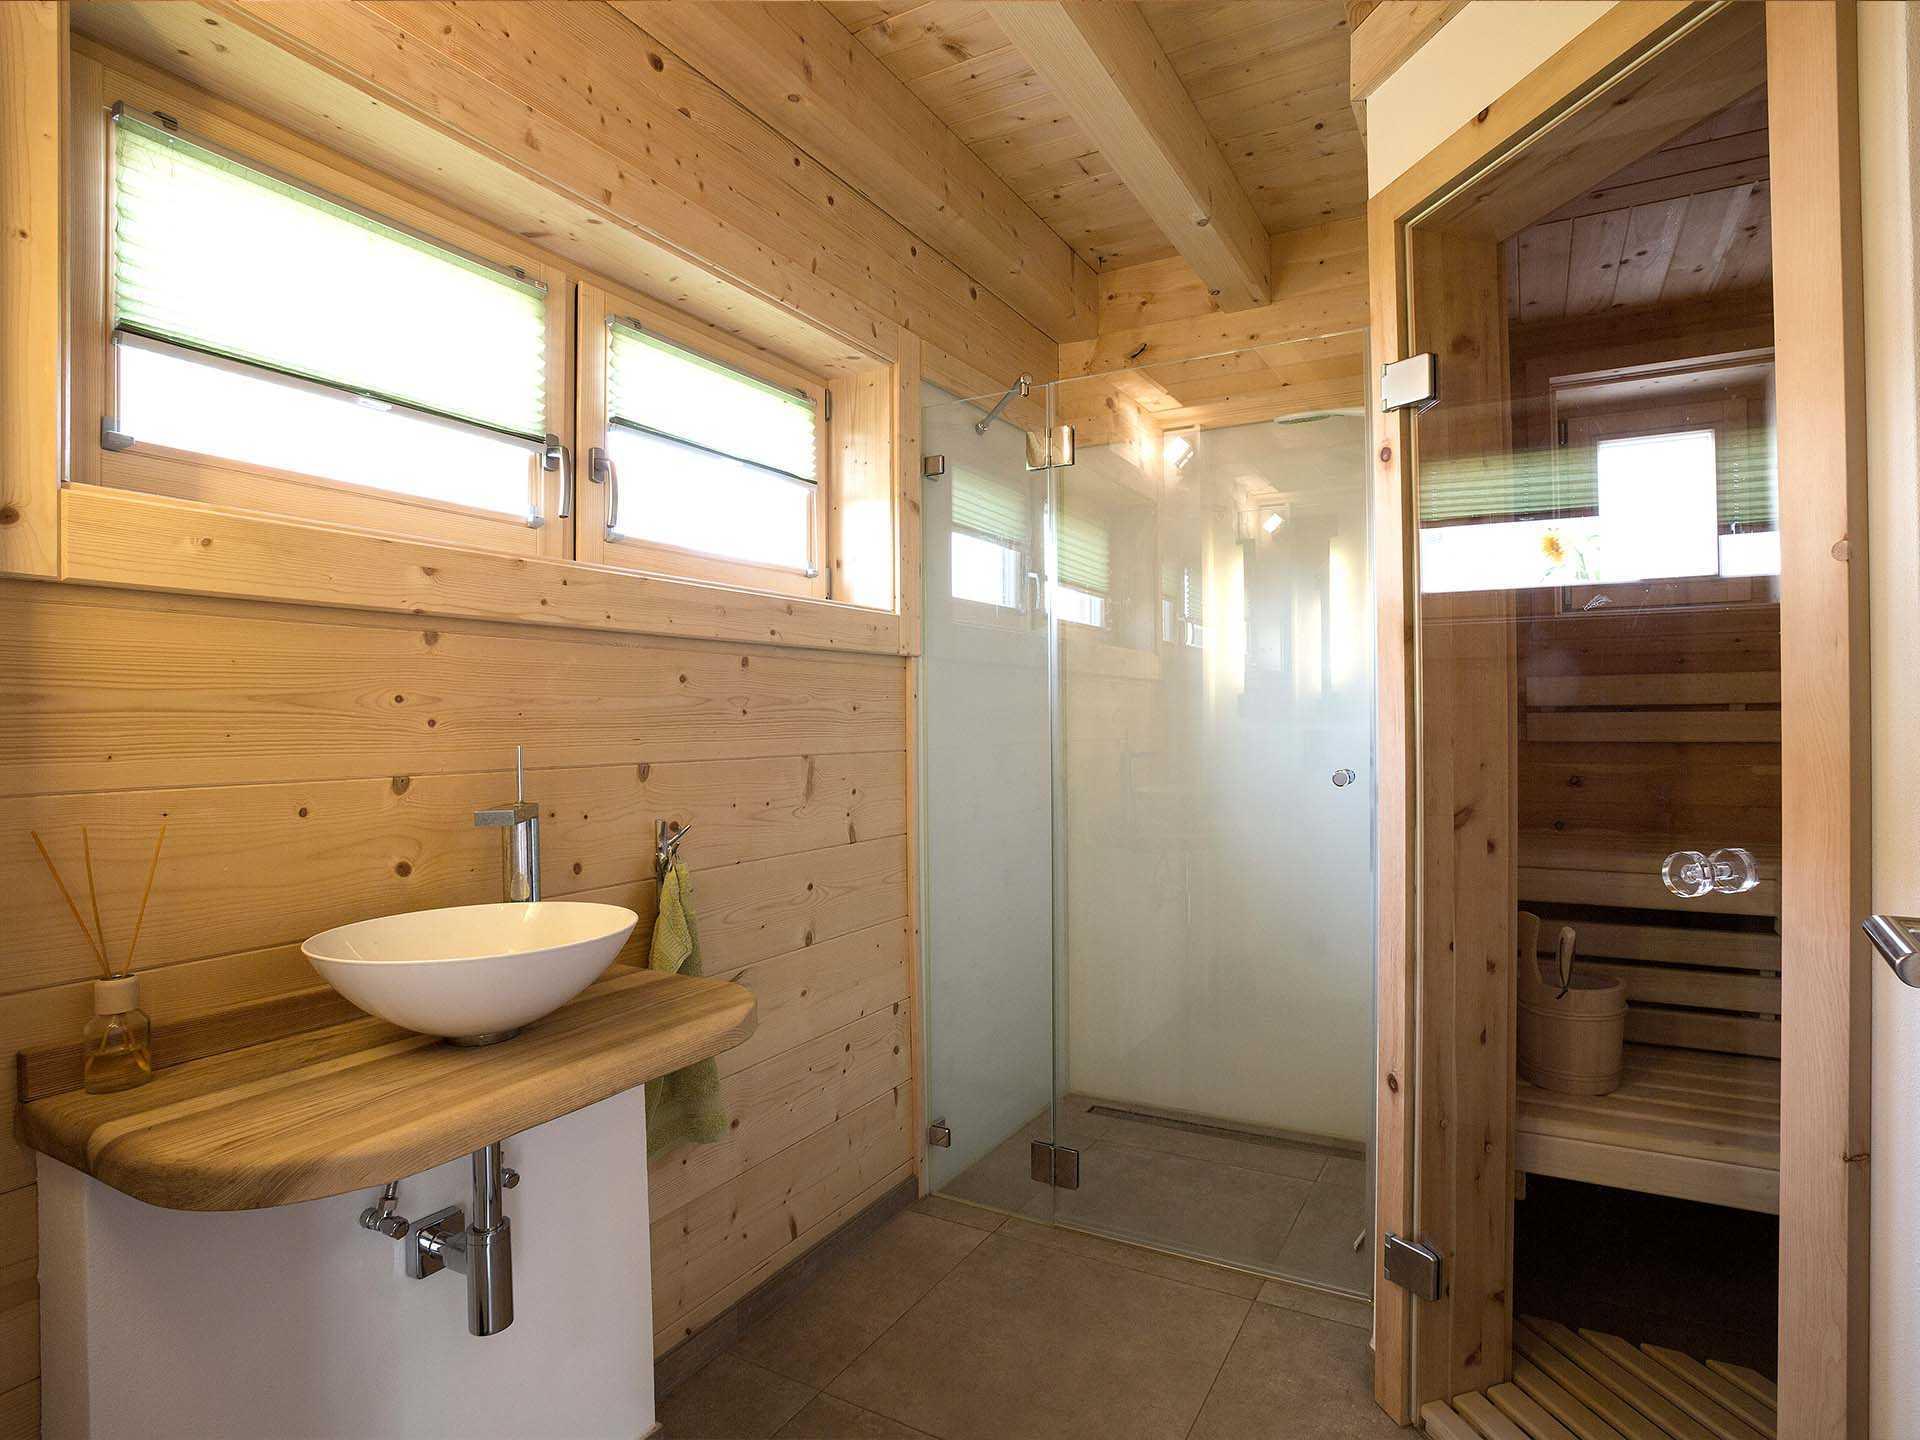 blockhaus chieming chiemgauer holzhaus. Black Bedroom Furniture Sets. Home Design Ideas